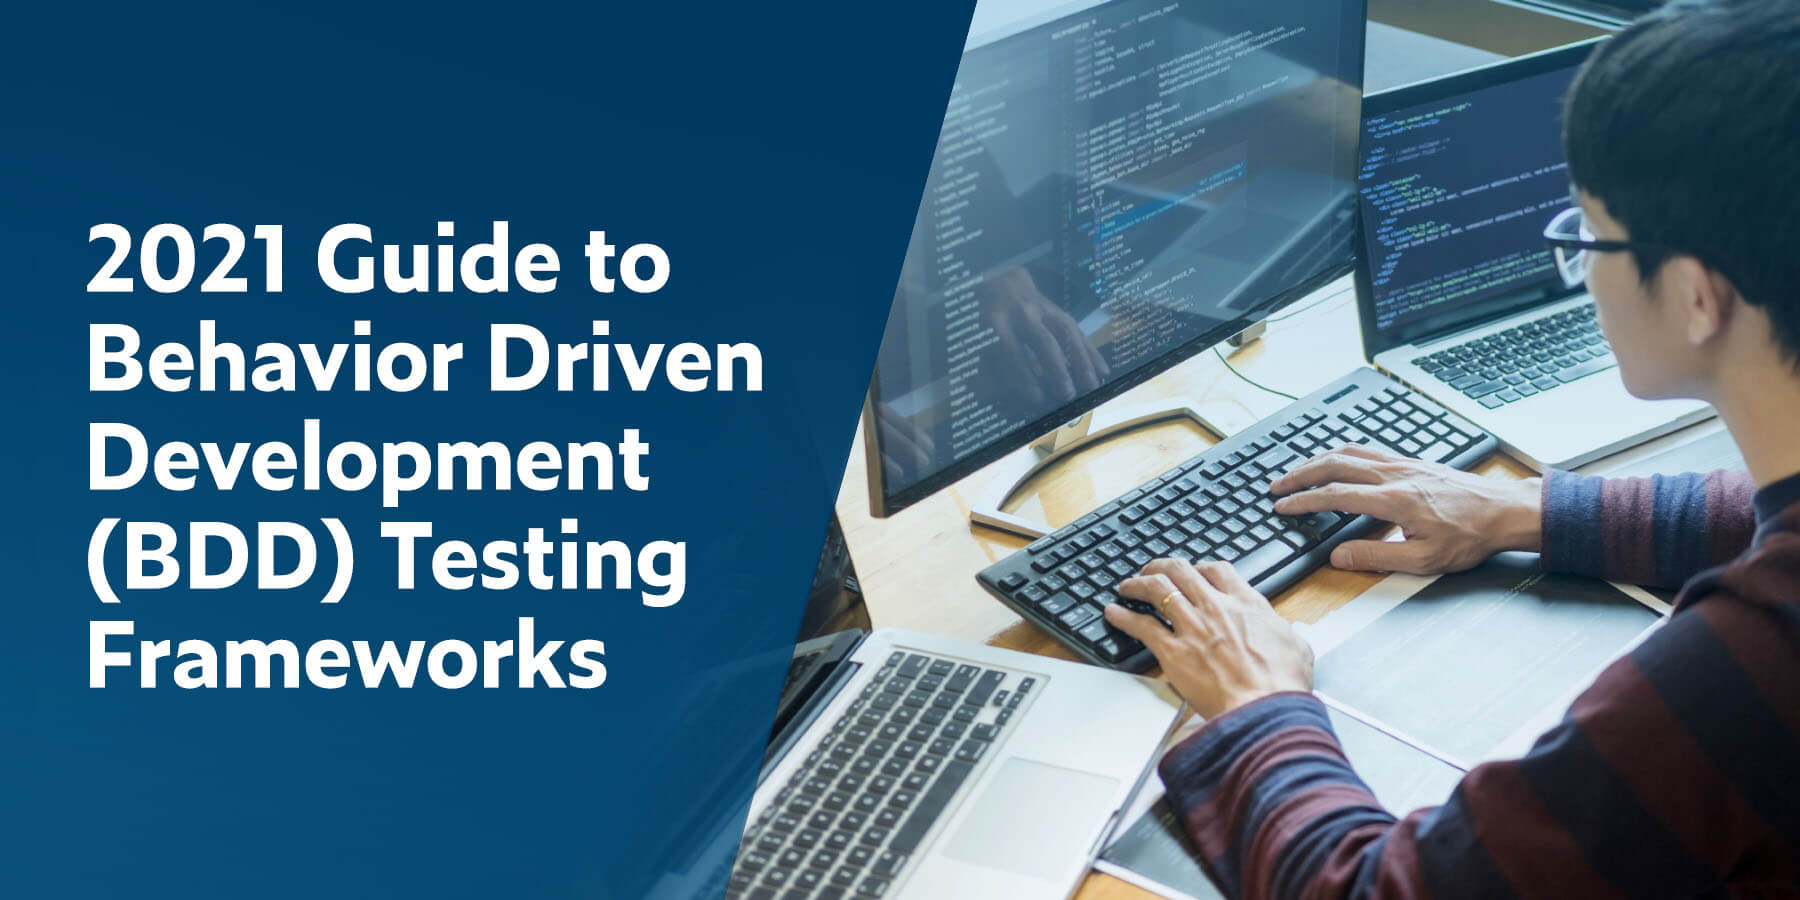 2021 Guide to Behavior Driven Development (BDD) Testing Frameworks